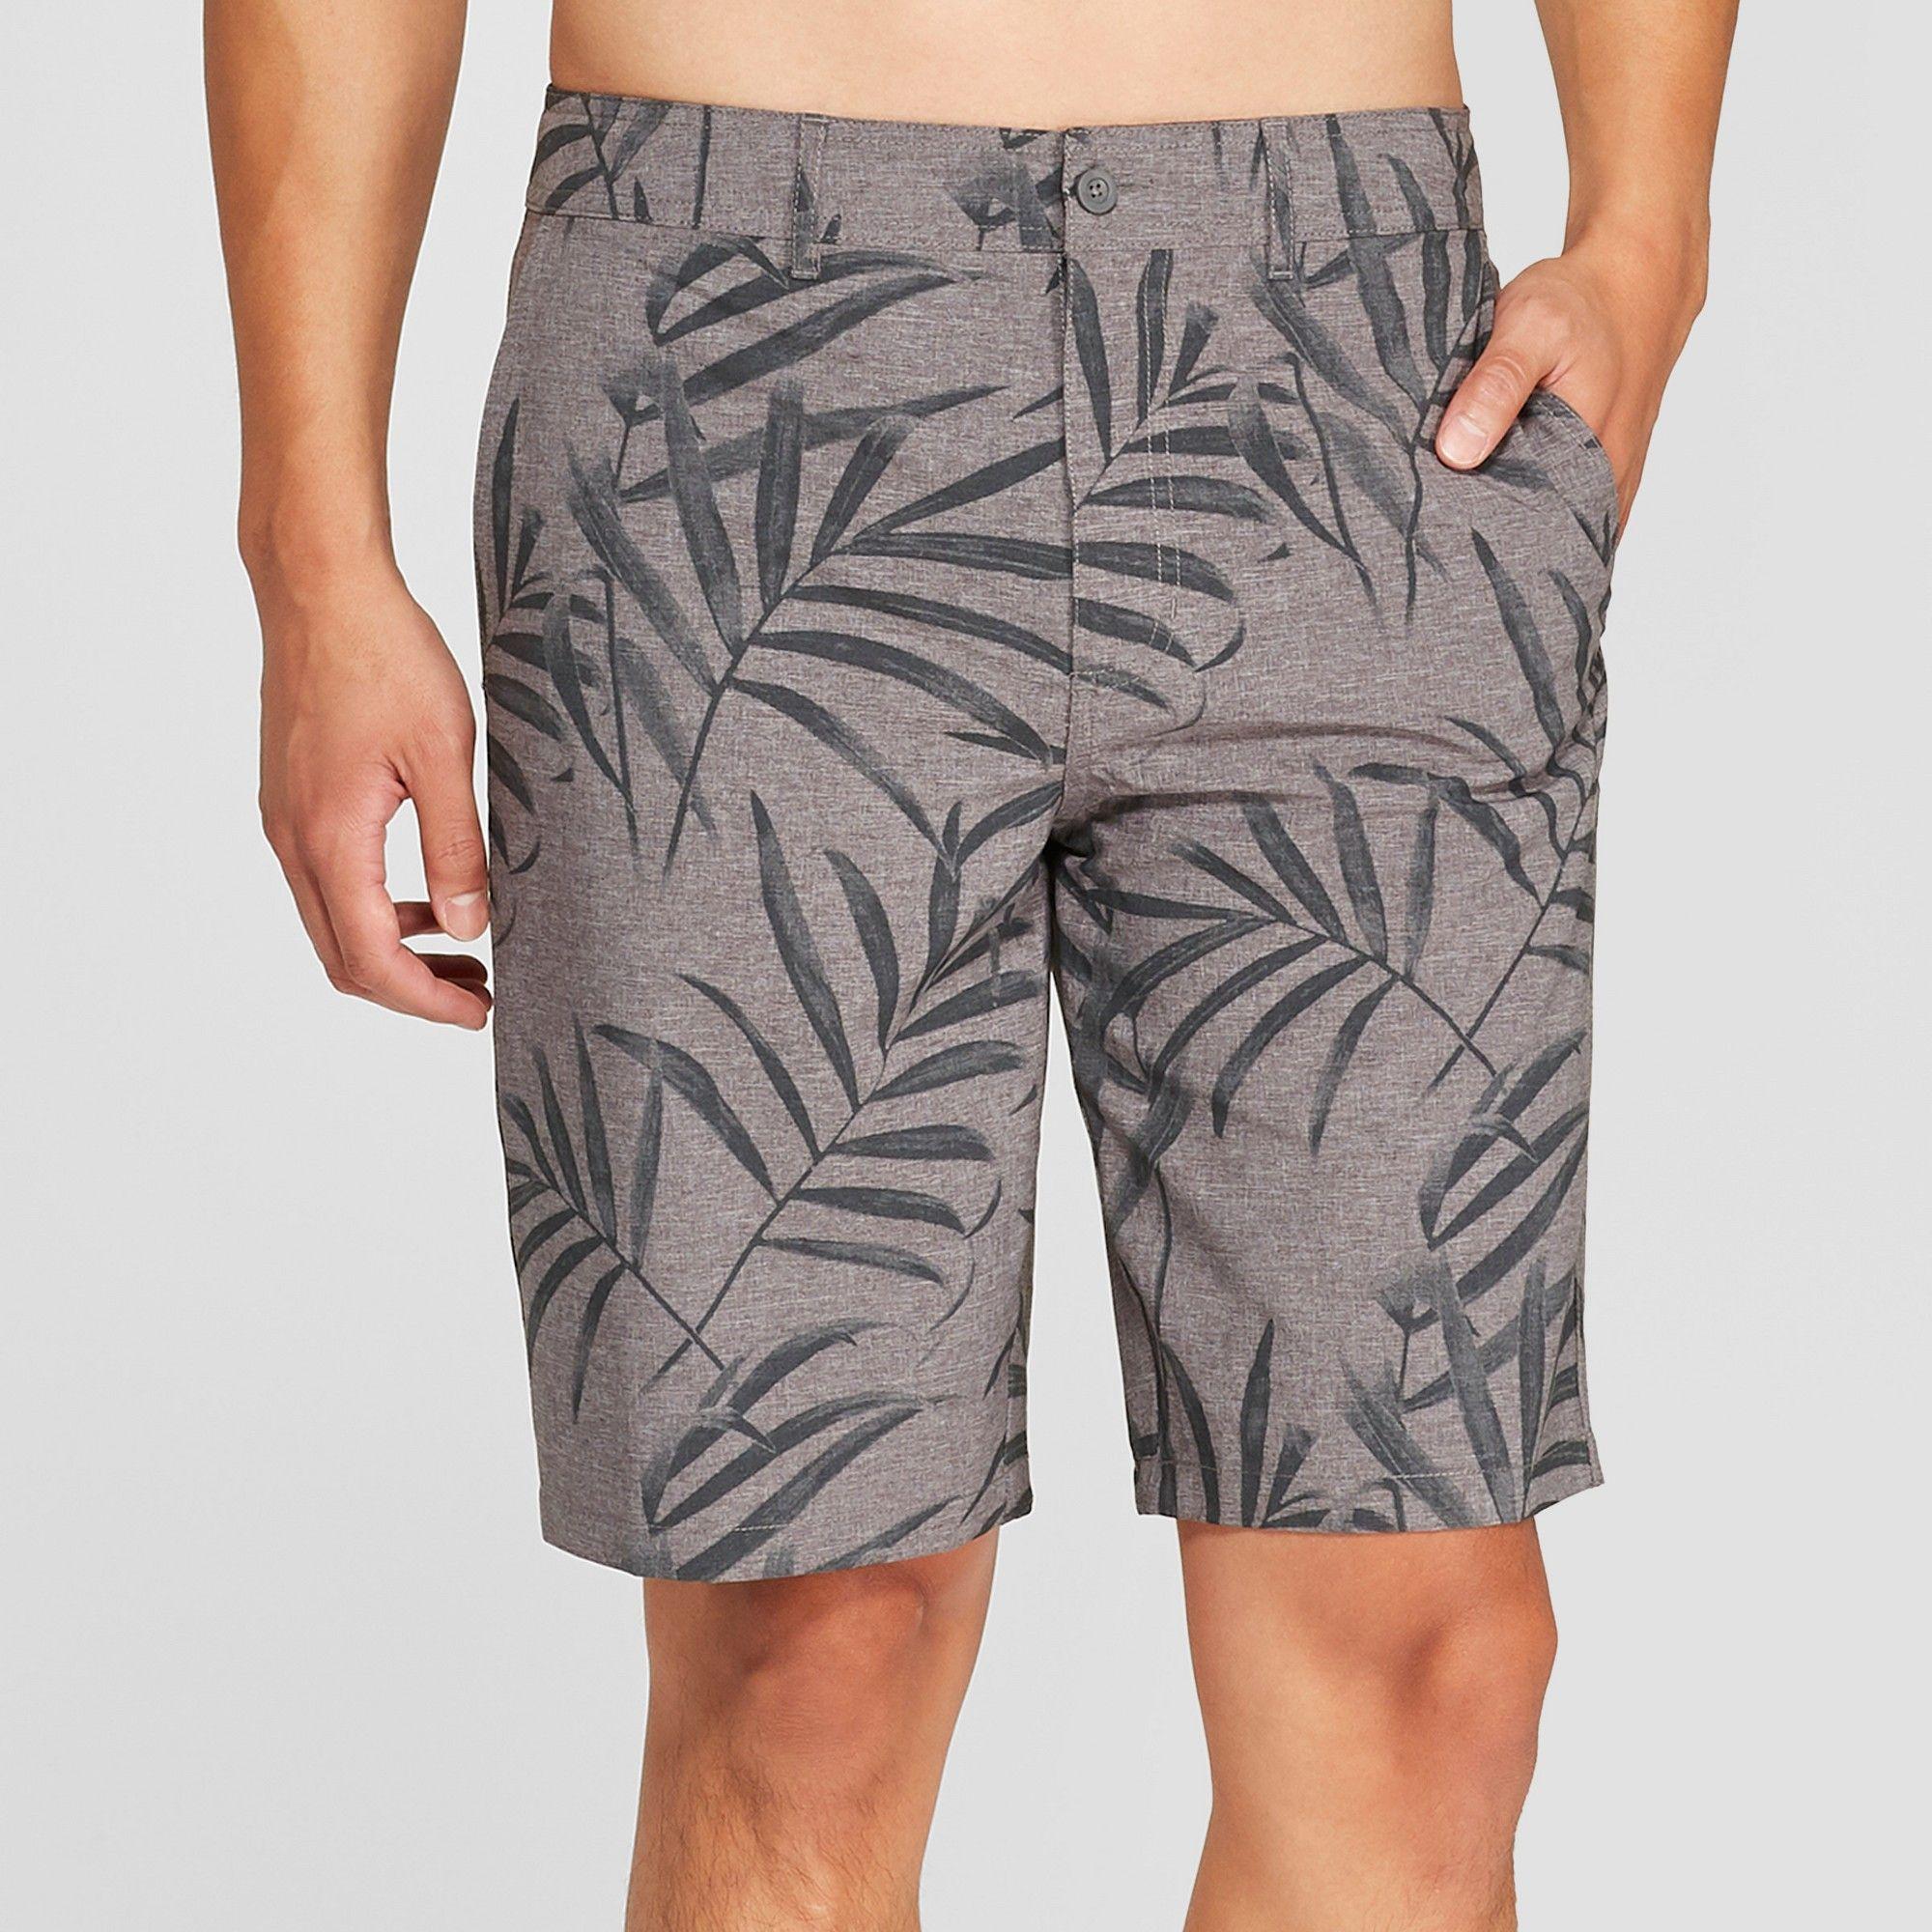 cc81621575 Men's 10.5 Burleigh Hybrid Swim Shorts - Goodfellow & Co Rich Charcoal 30,  Gray